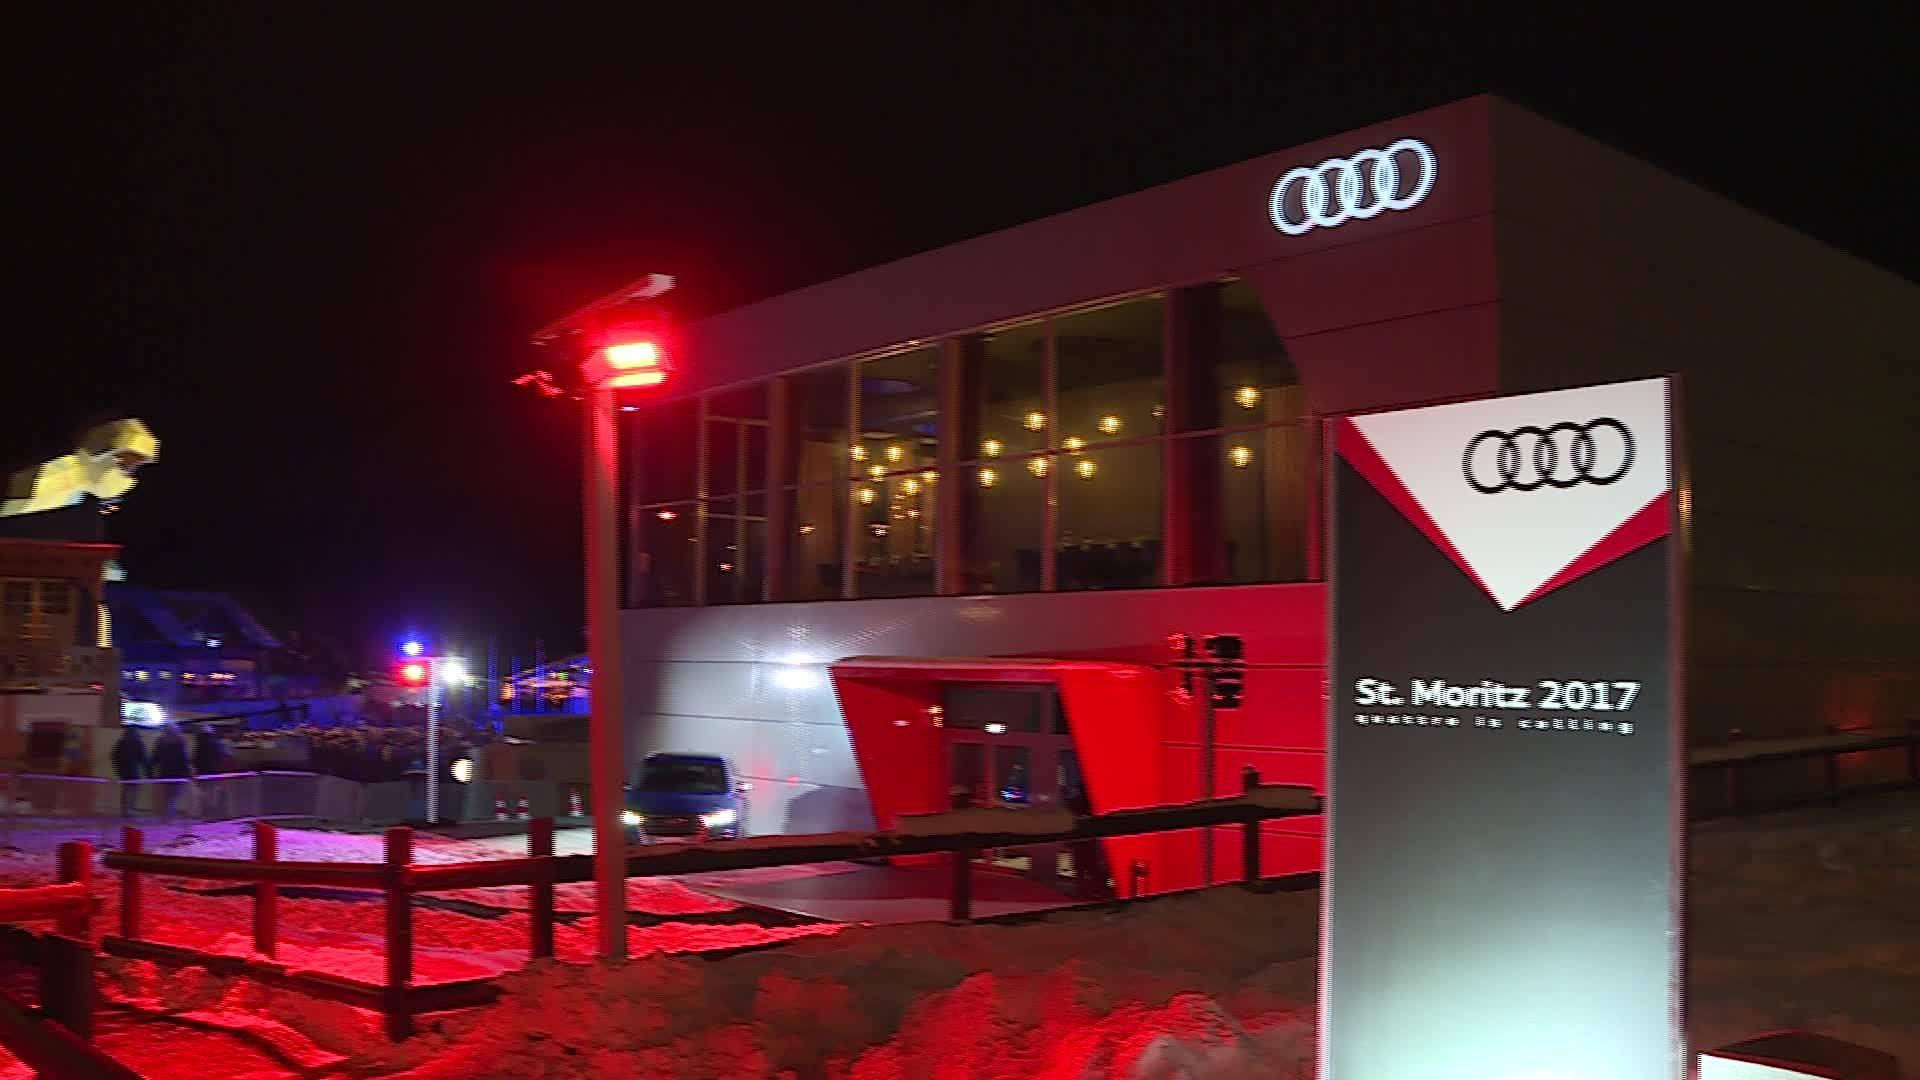 Successful Alpine World Ski Championships for Audi in St. Moritz